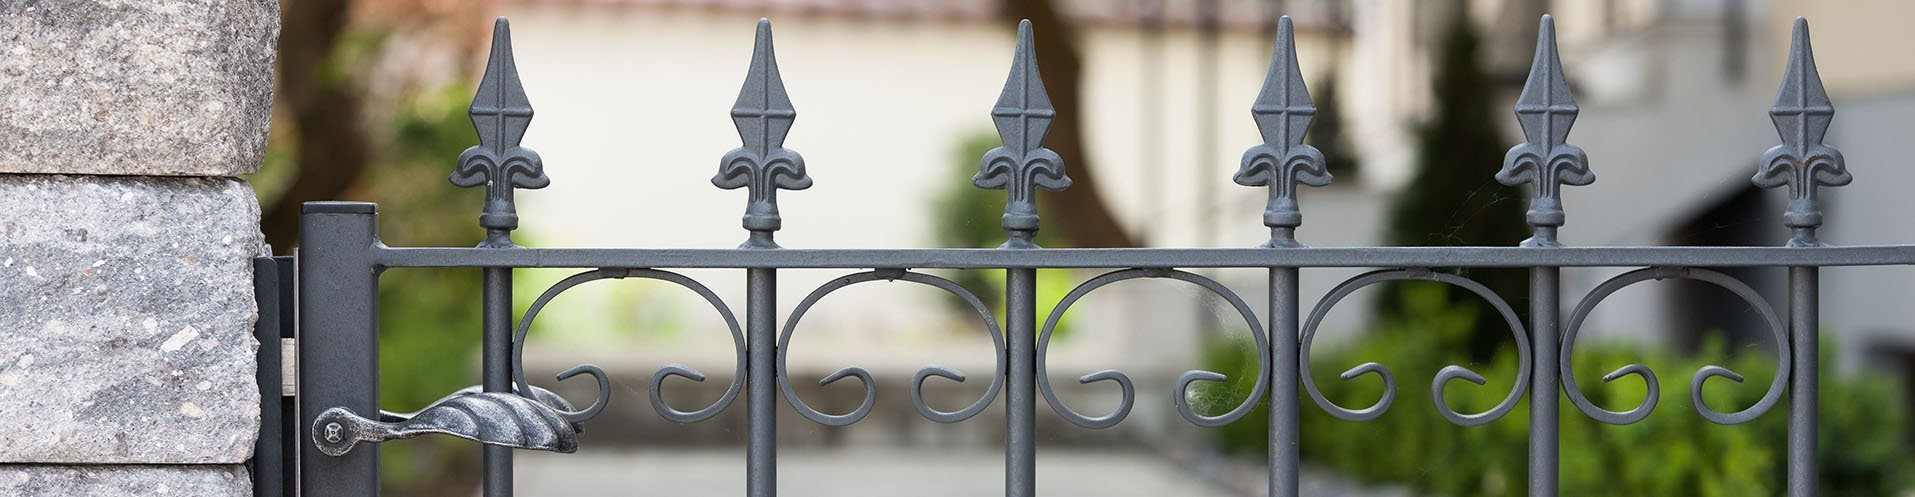 Gartentüren aus Metall